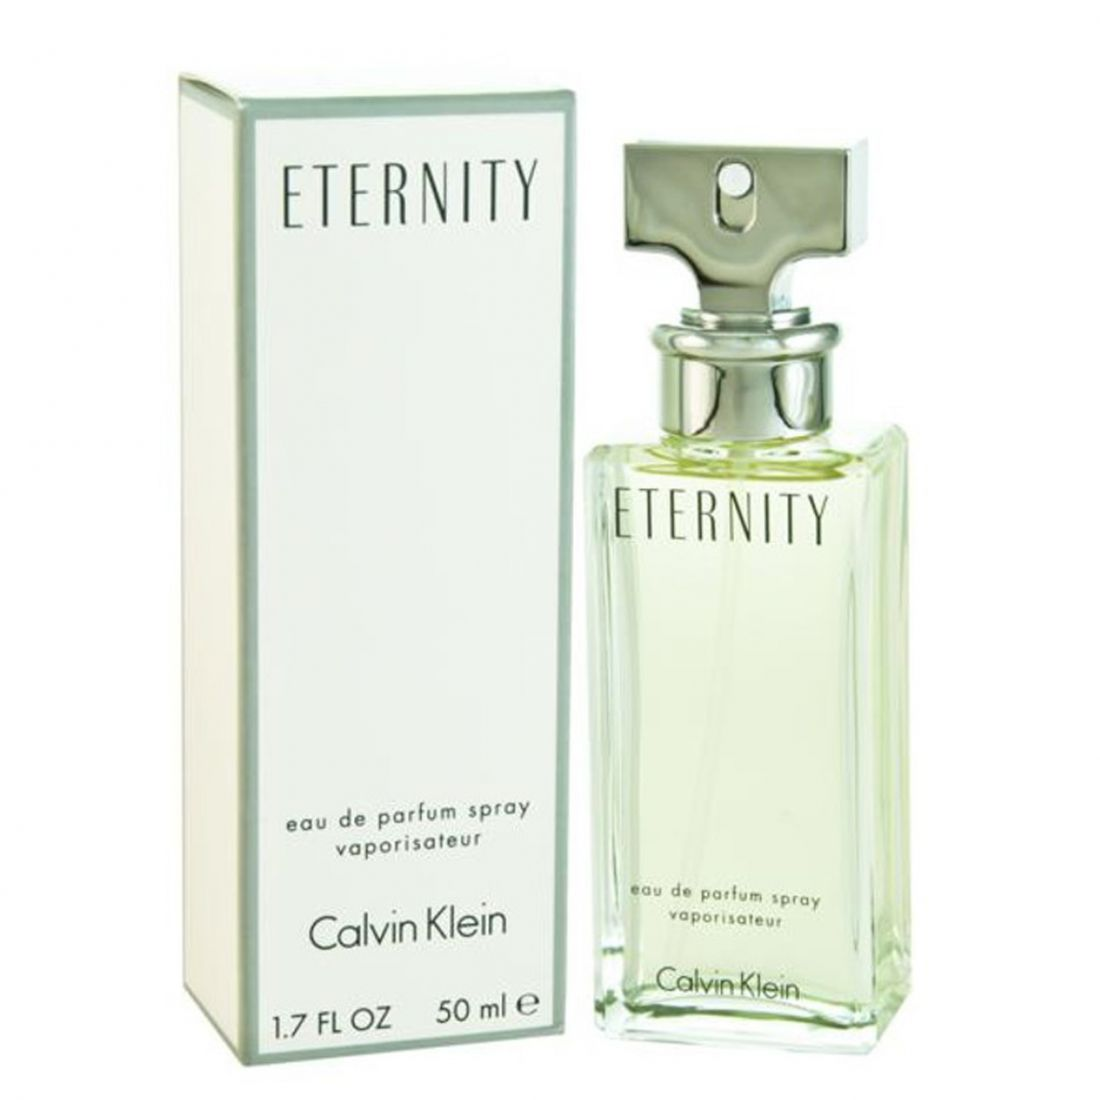 Calvin Klein - Eternity, 50 ml